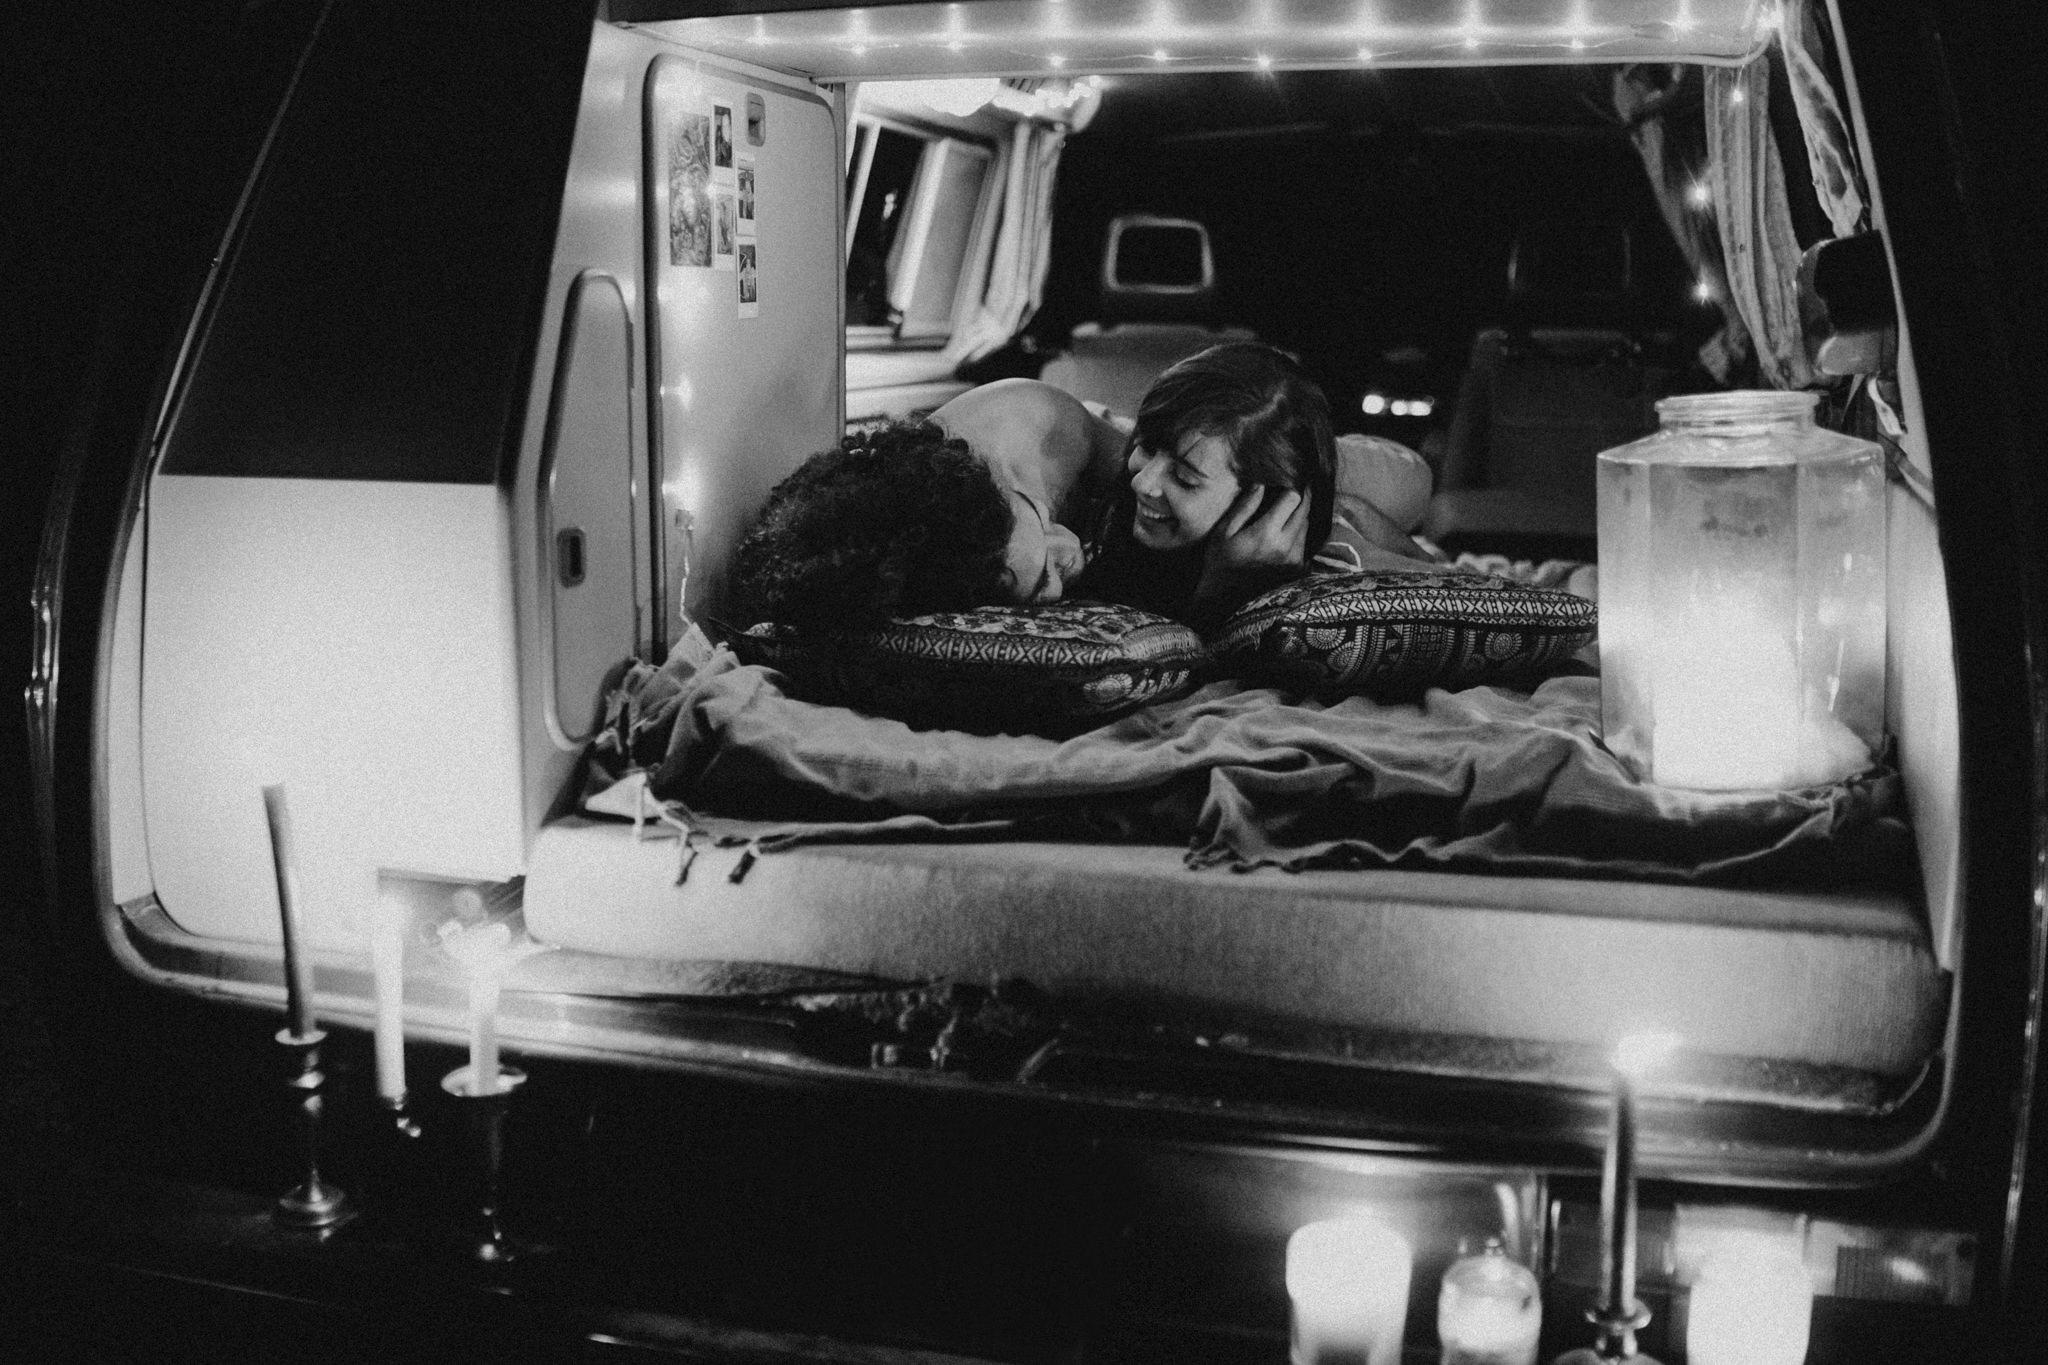 The couple enjoying each other inside a camper van VW Westie Elopement Sombrio Beach Vancouver Island